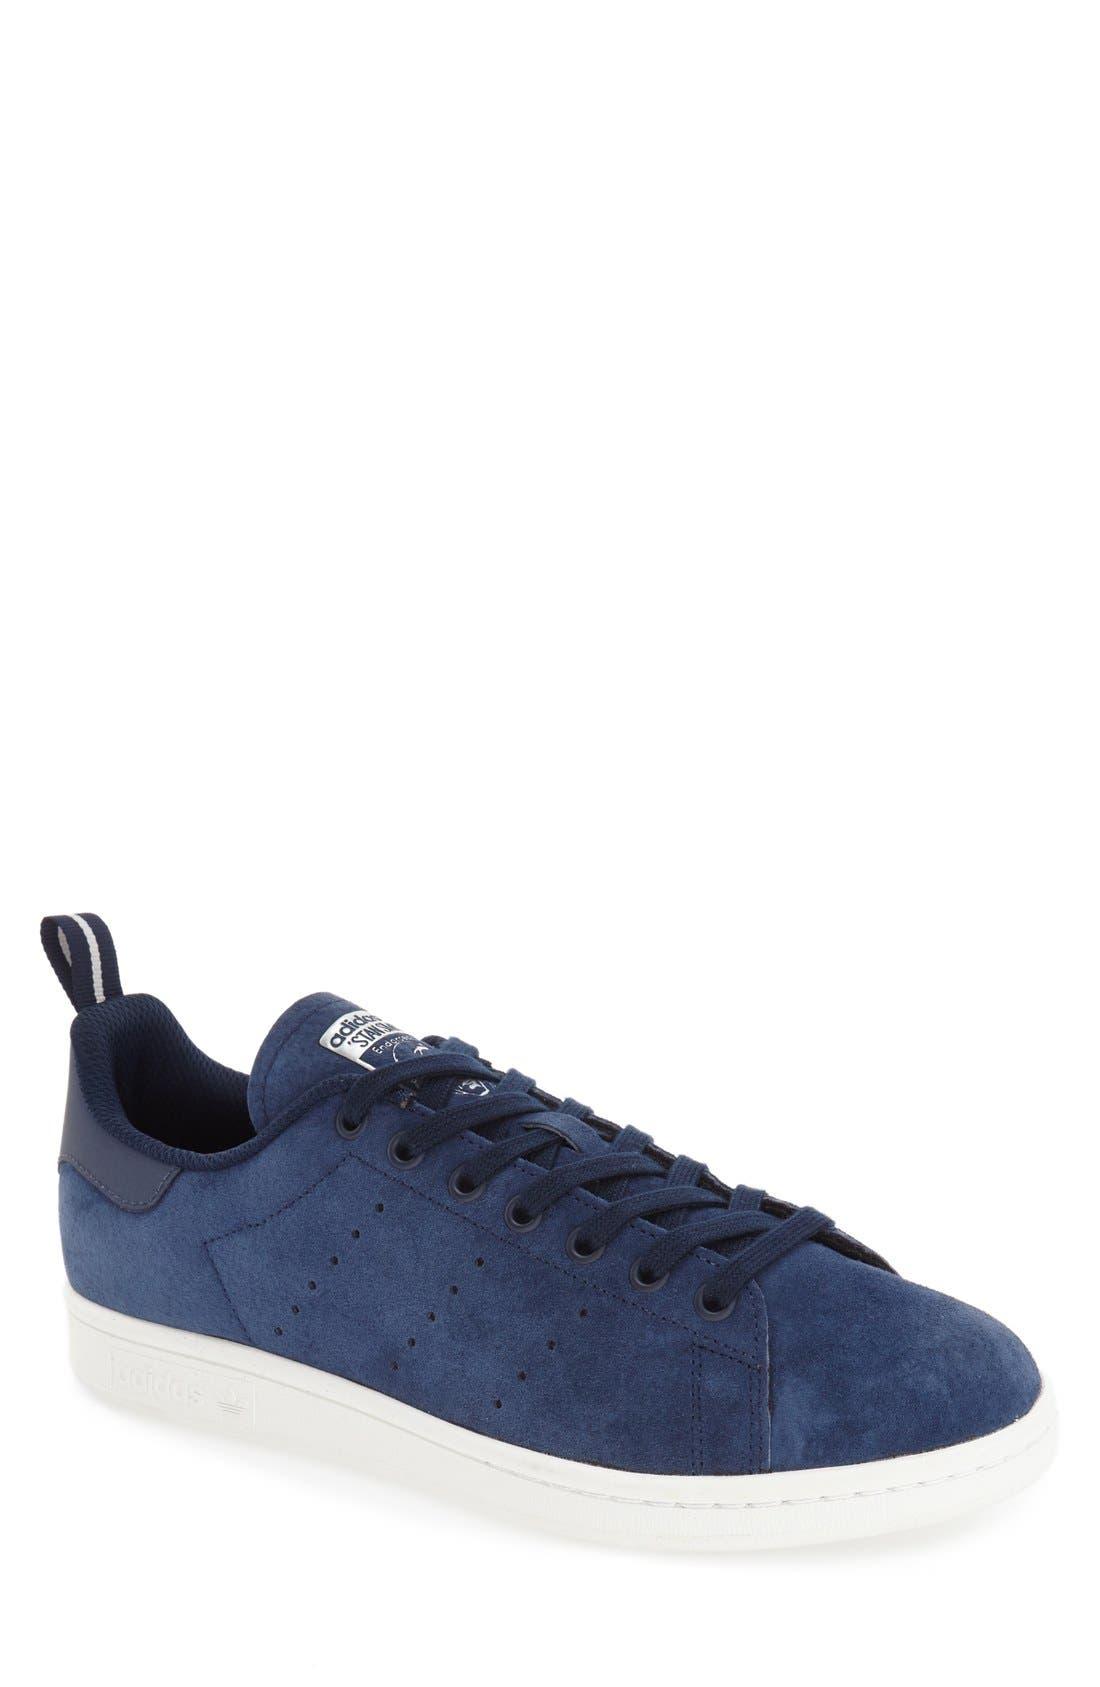 Main Image - adidas Stan Smith Sneaker (Men)